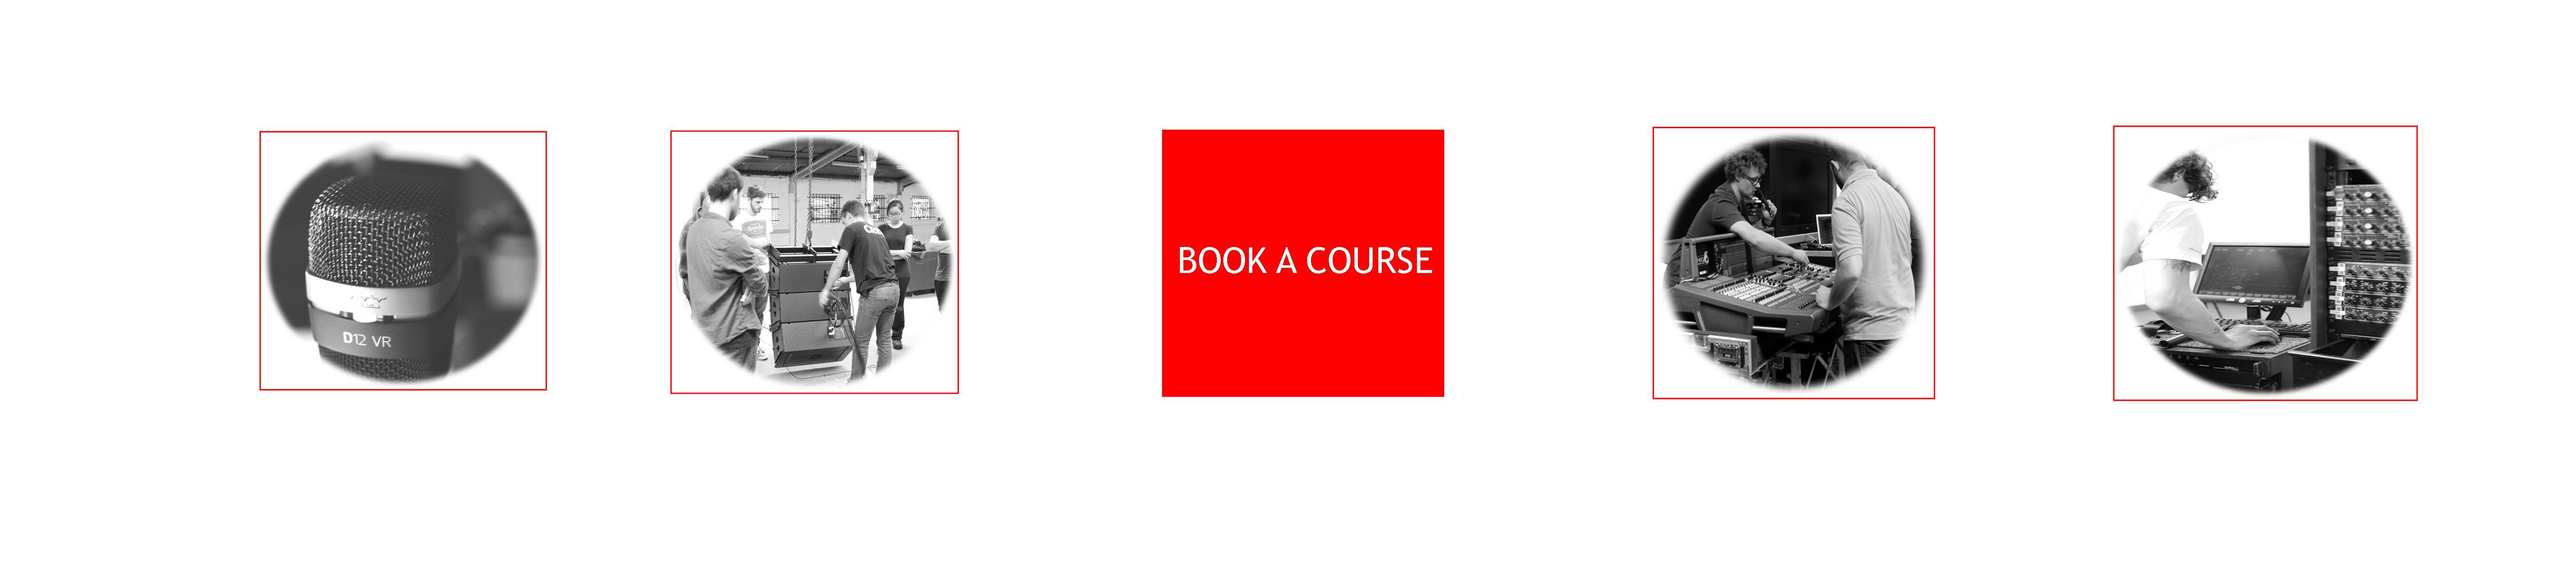 Book-a-course-slider